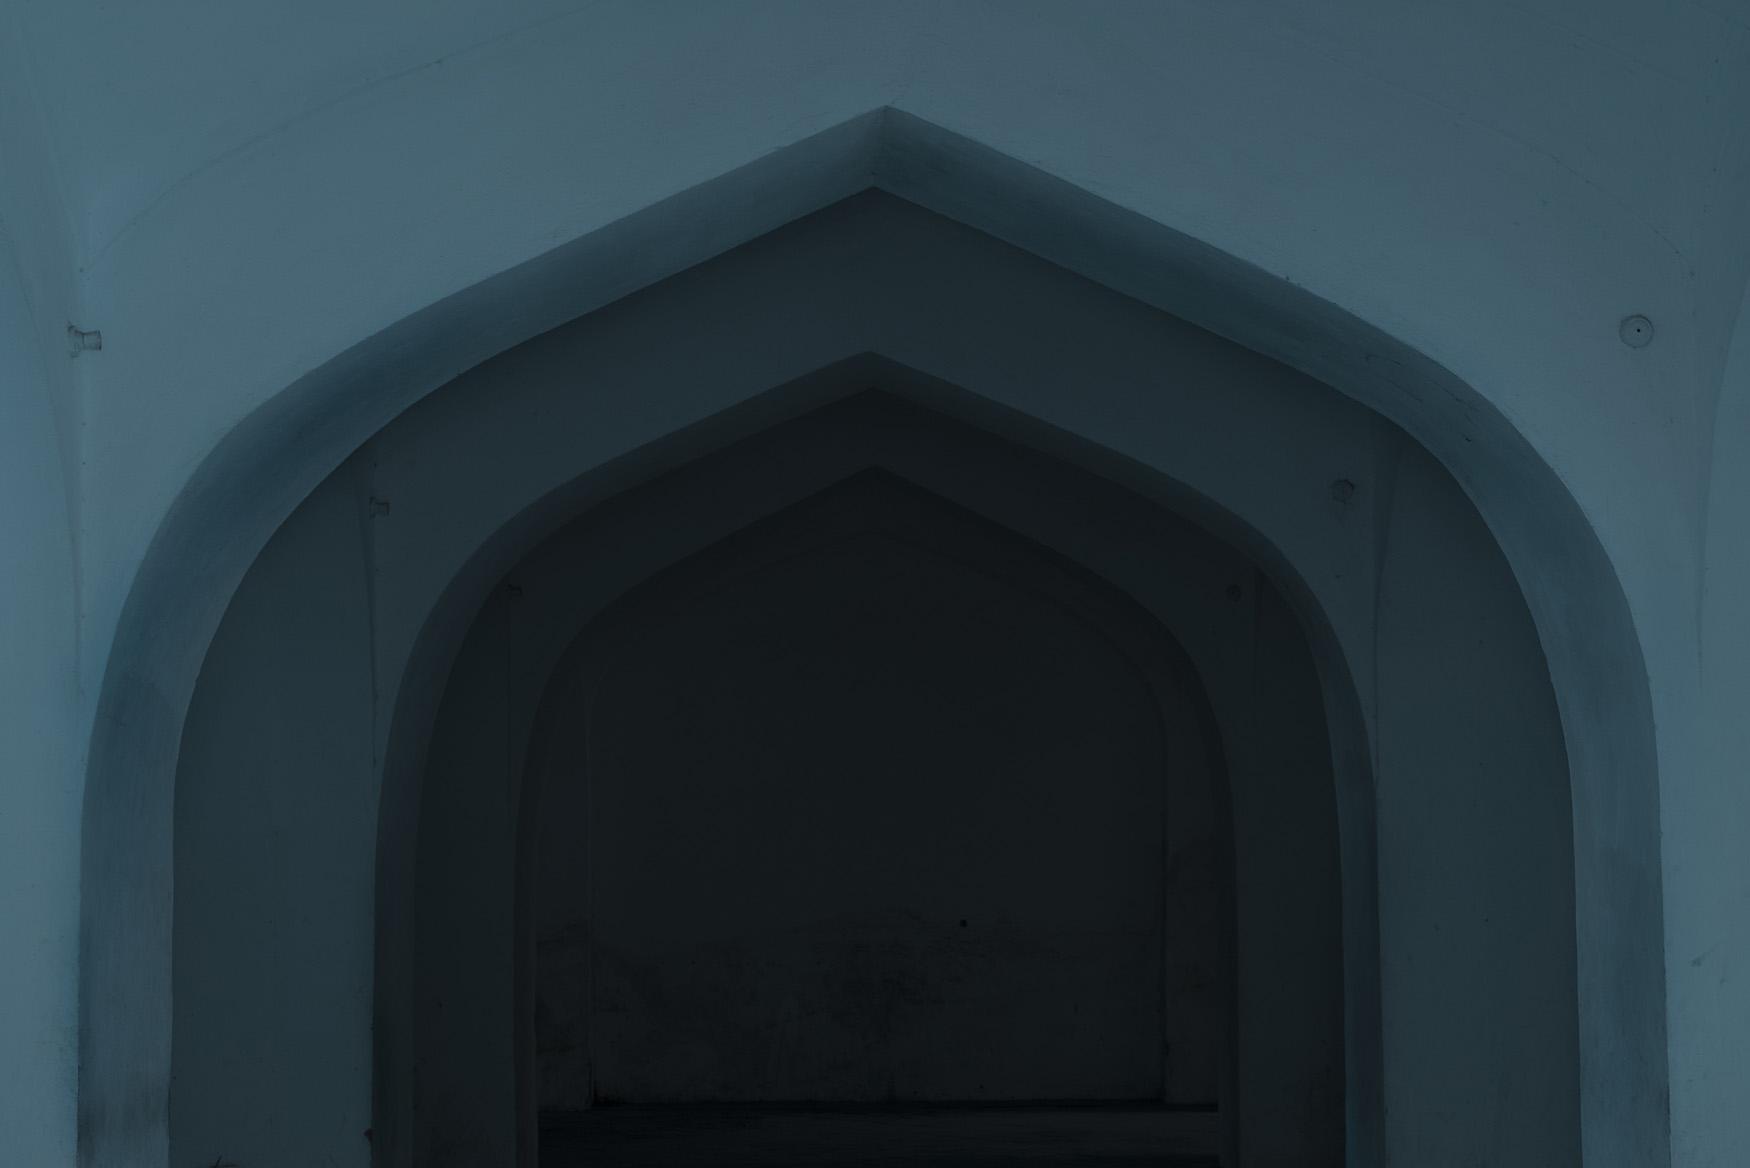 Geometrie moghul